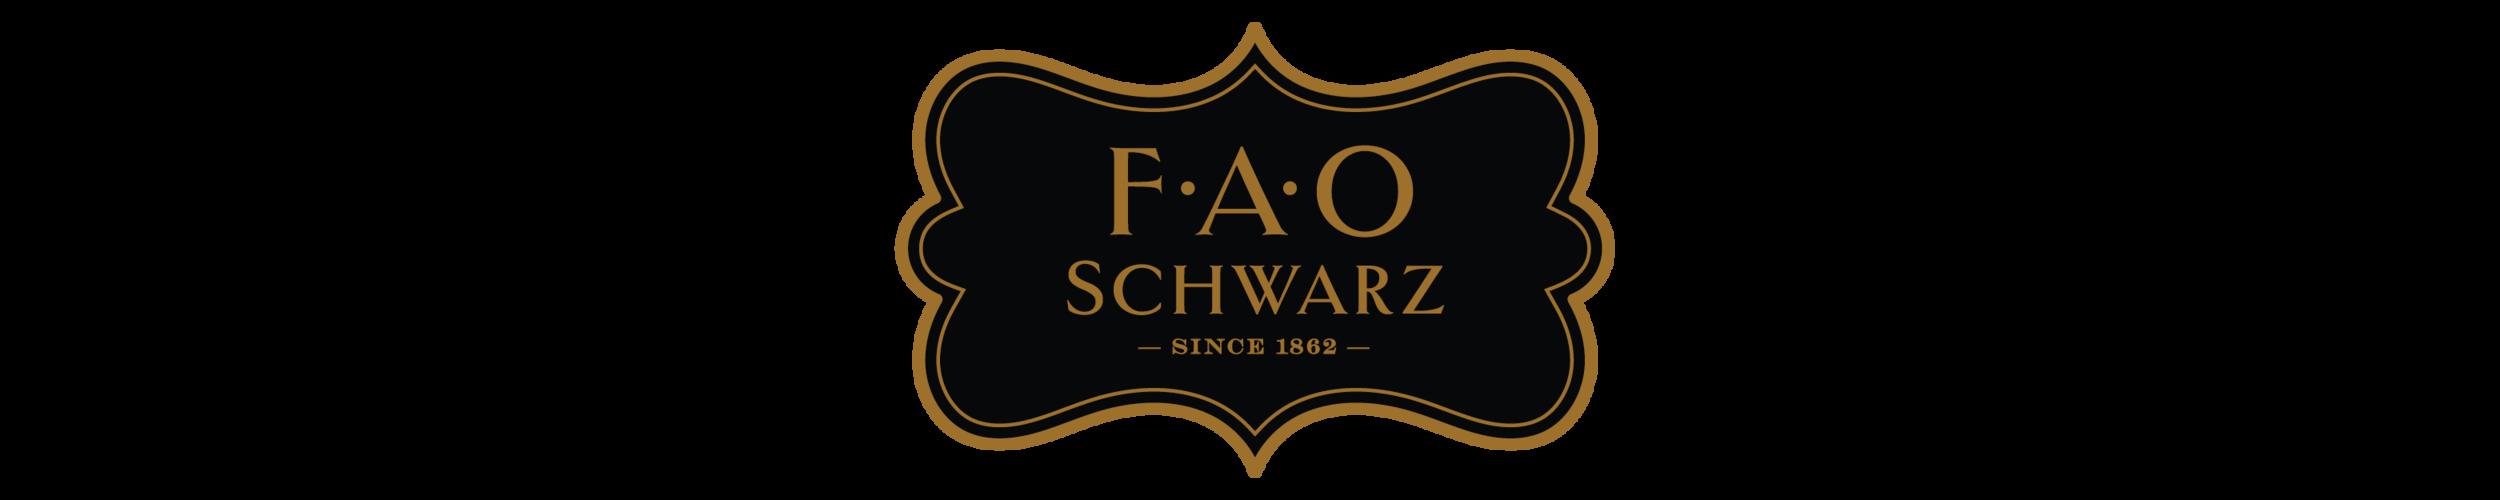 FAO_logo.png